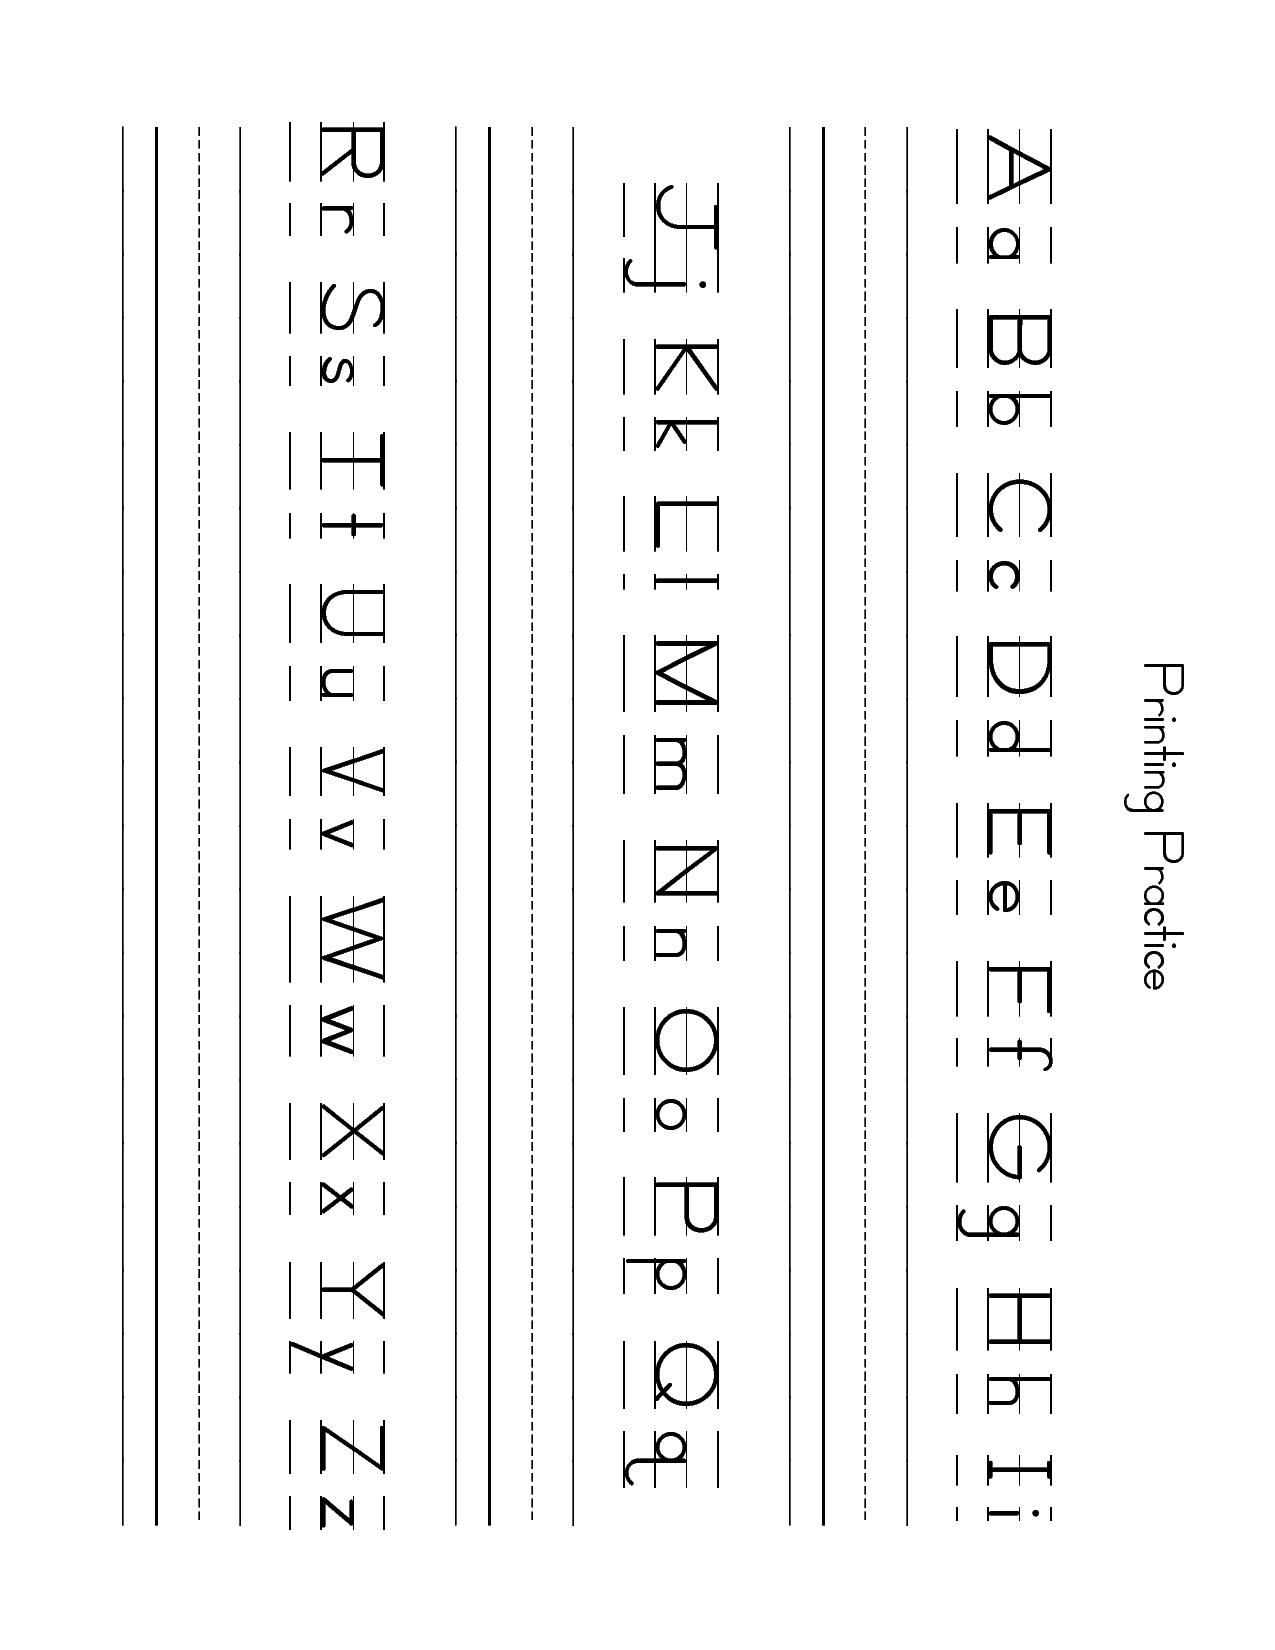 Printable Digraph Worksheets For Kindergarten In